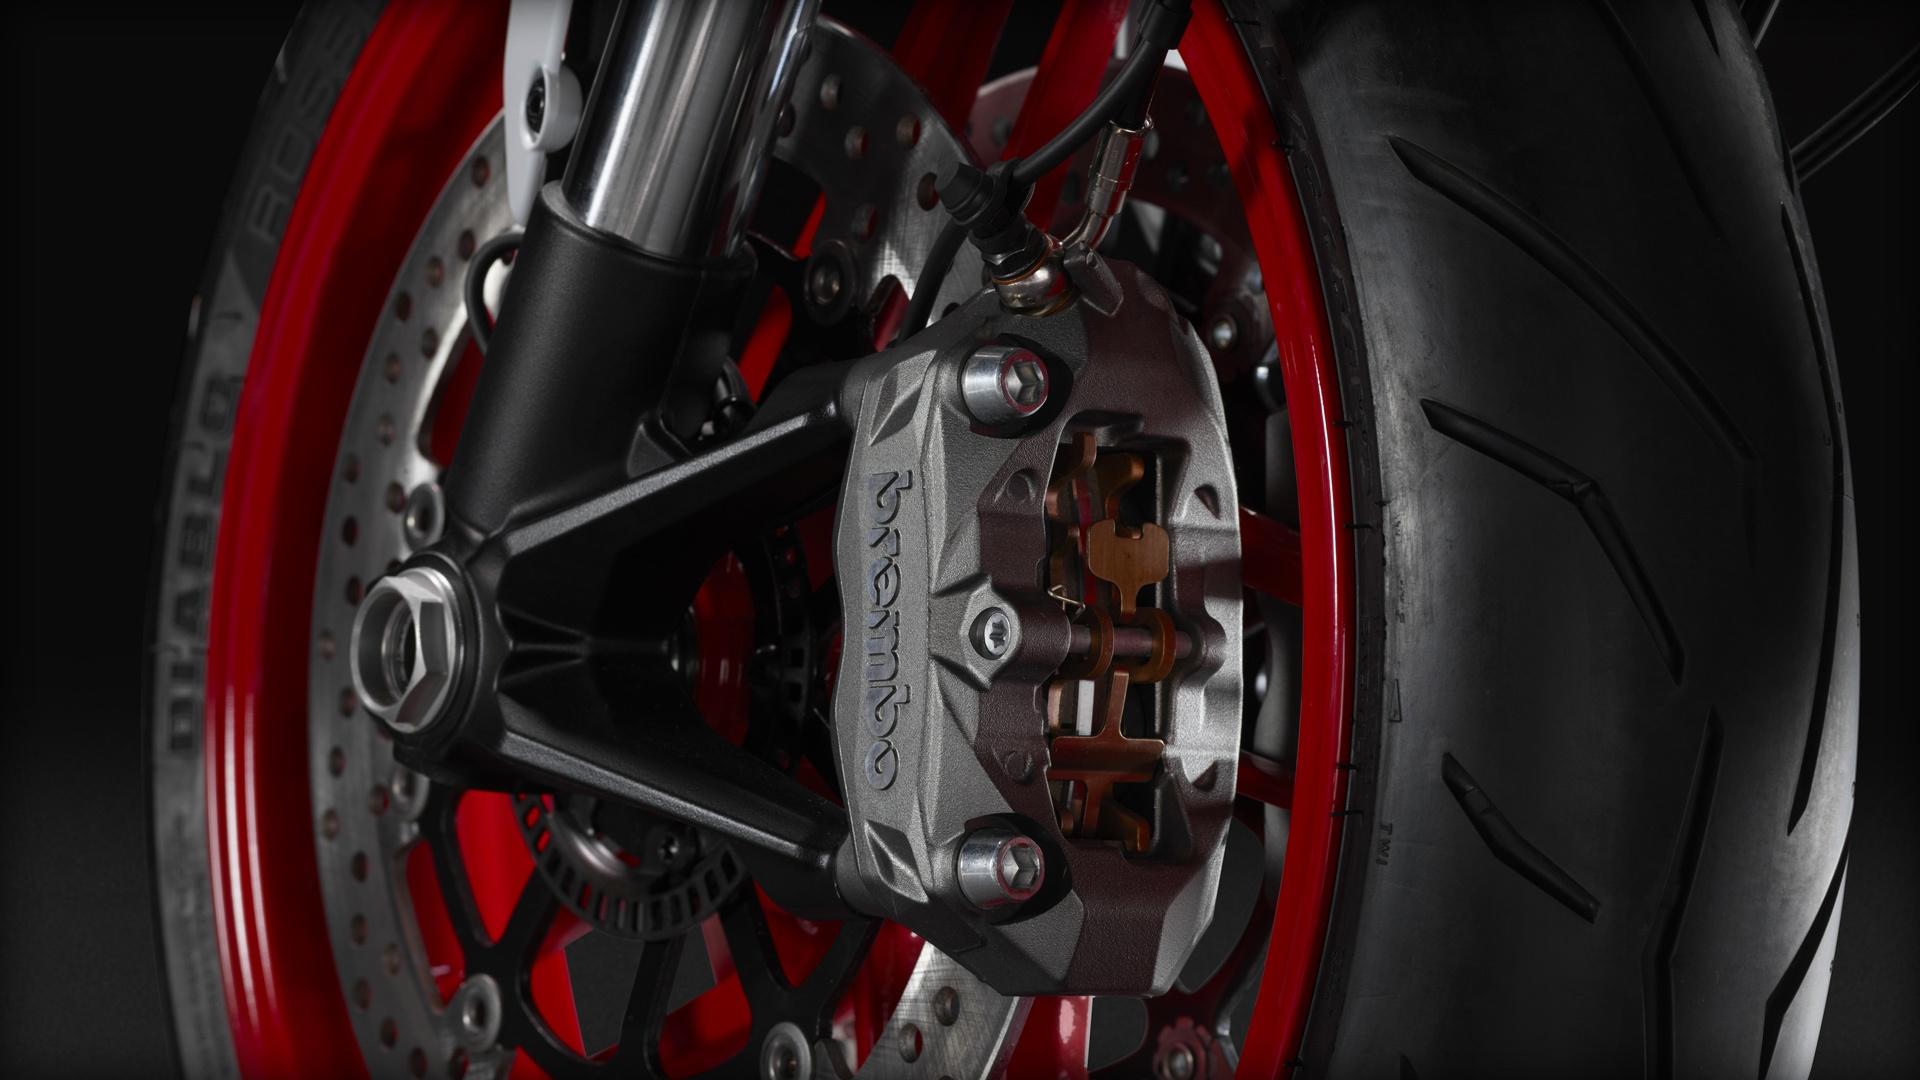 МОТОЦИКЛ DUCATI MONSTER 797 ― Артмото - купить квадроцикл в украине и харькове, мотоцикл, снегоход, скутер, мопед, электромобиль